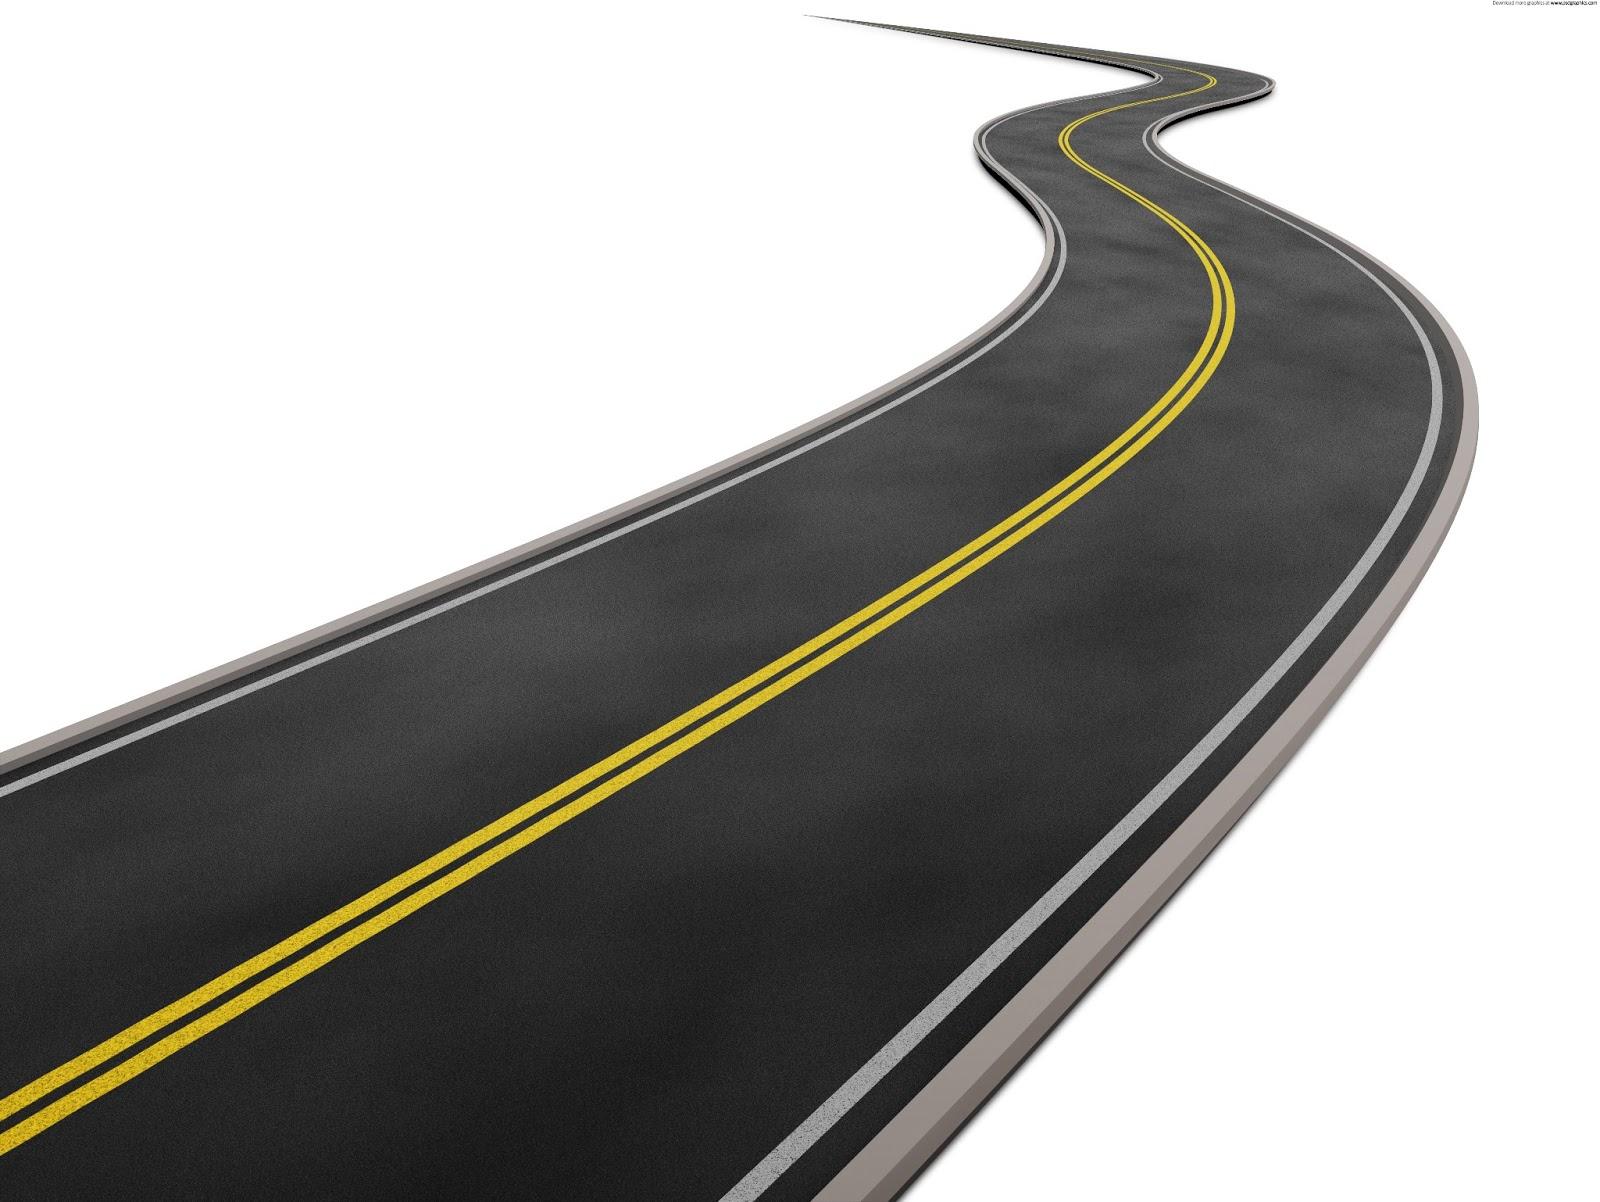 PNG Horizontal Road Transparent Horizontal Road.PNG Images.